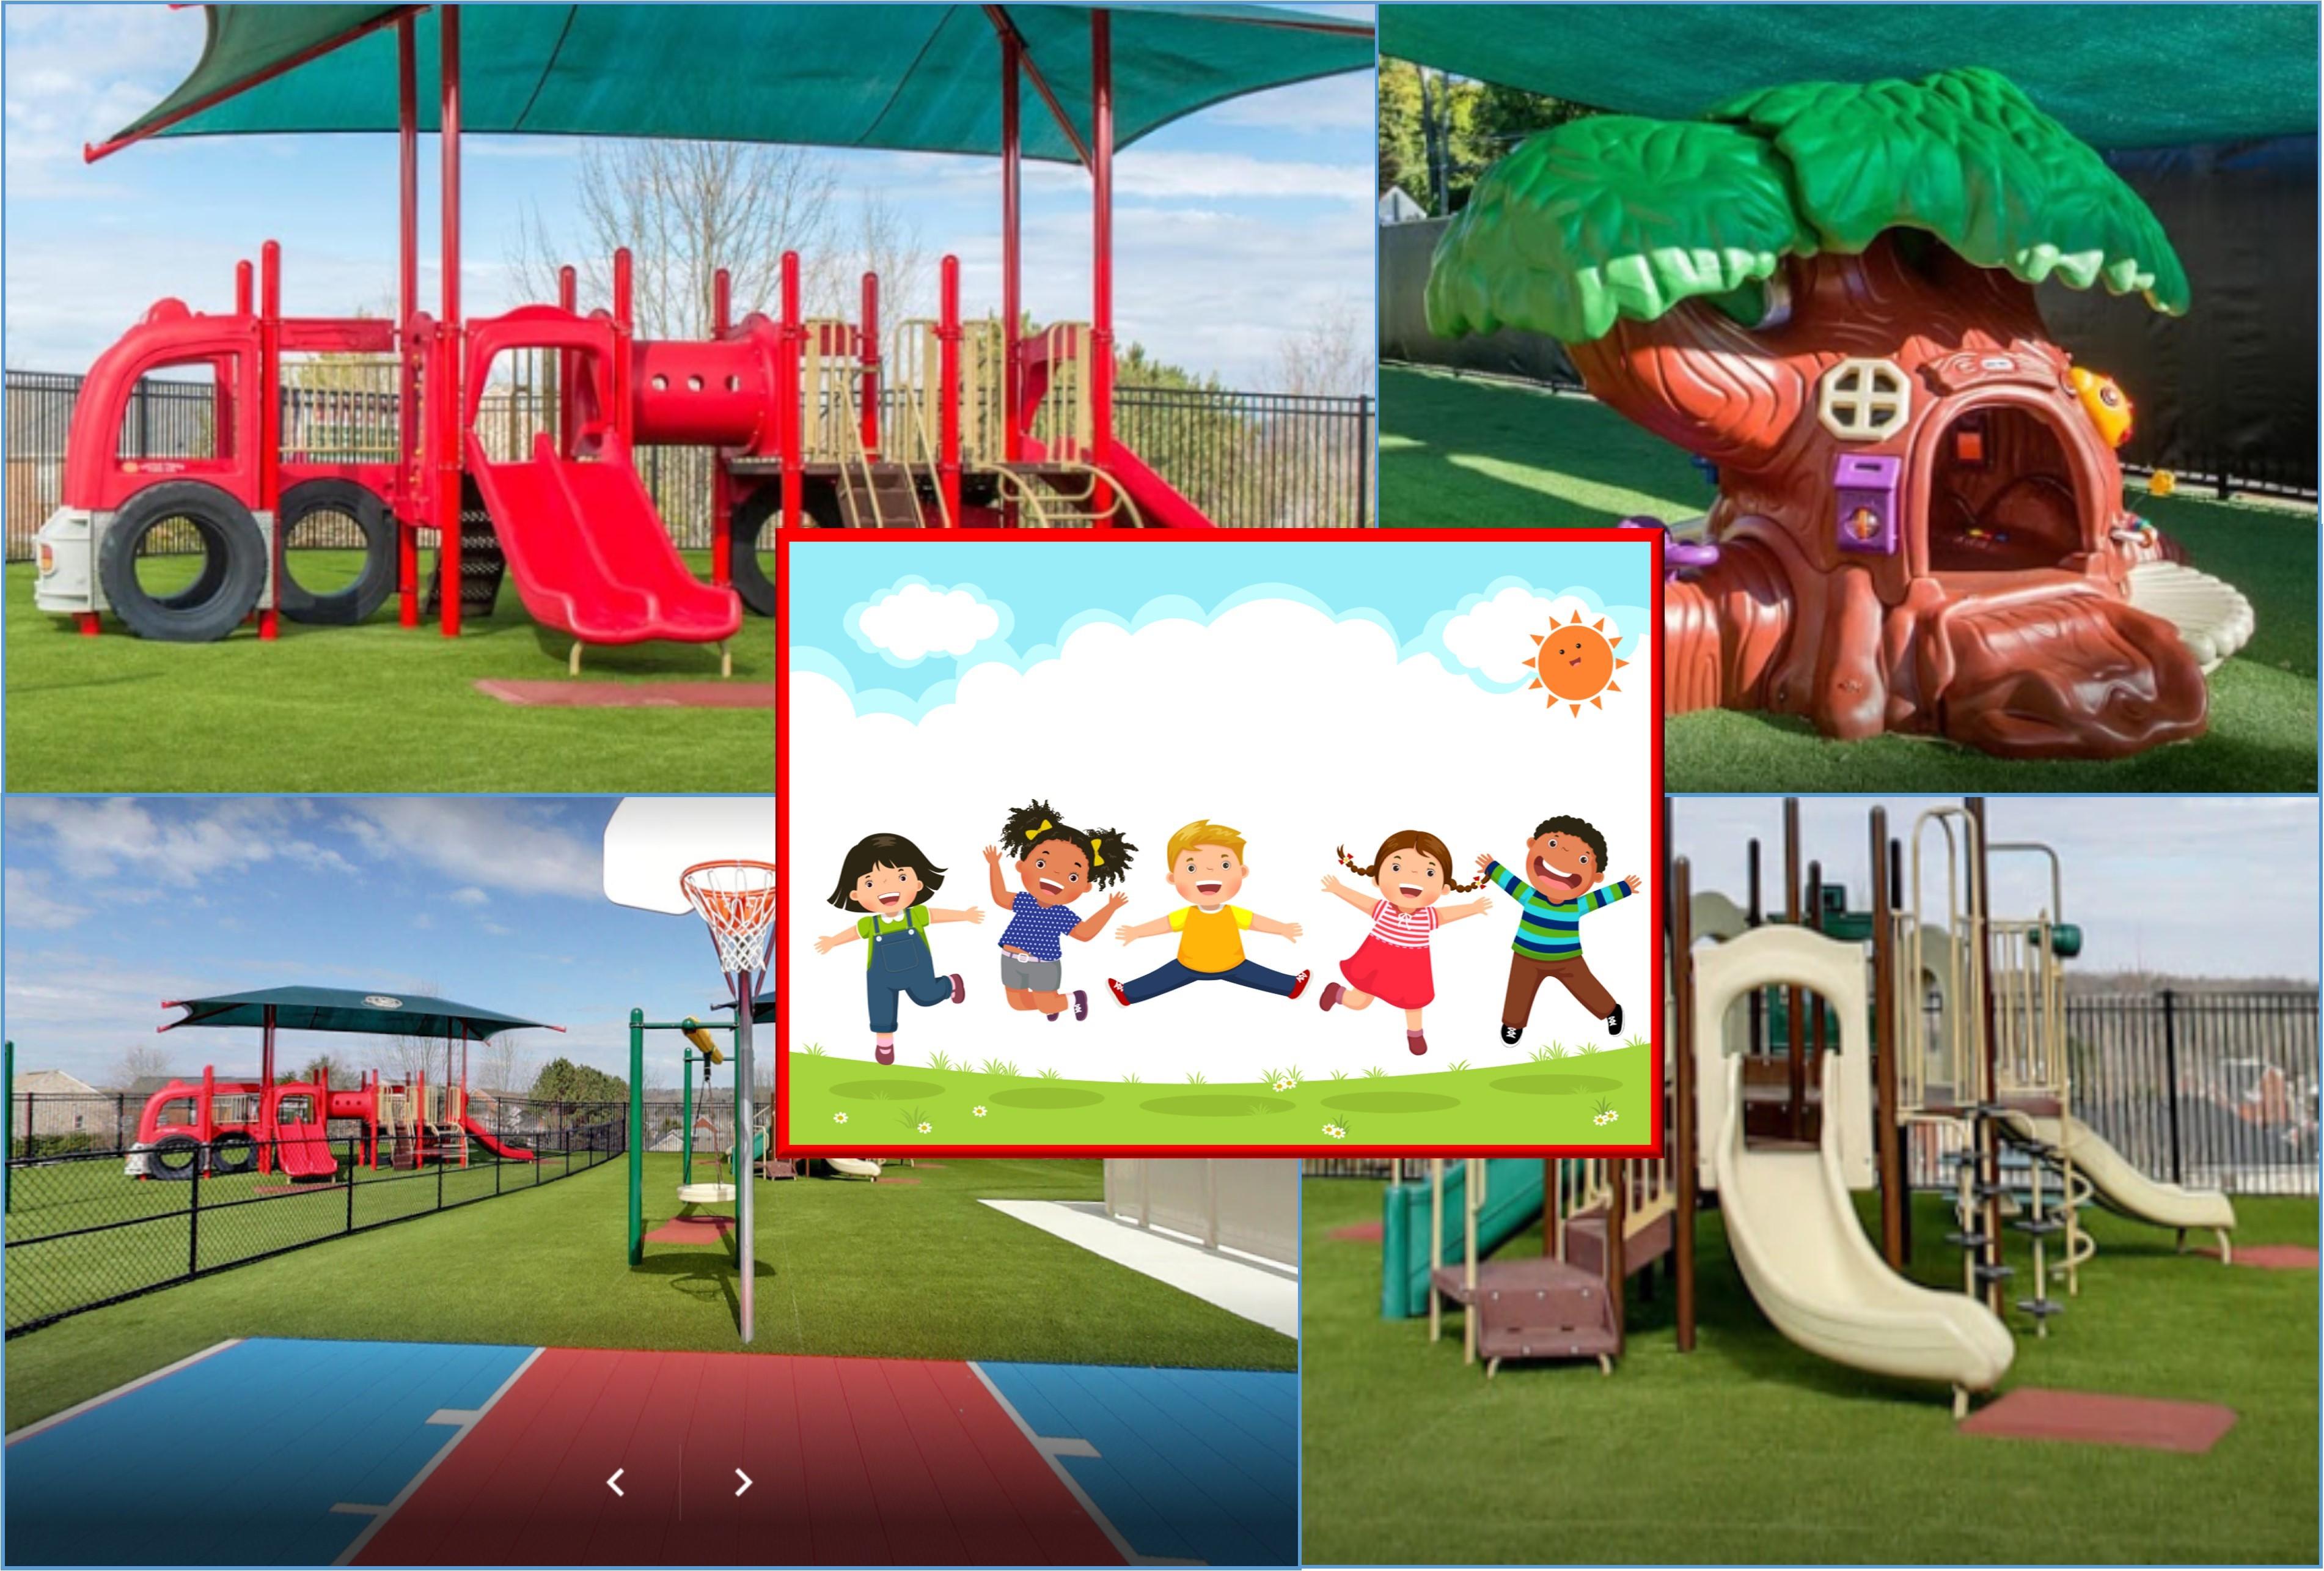 Playground equipment fun outside children playing preschool